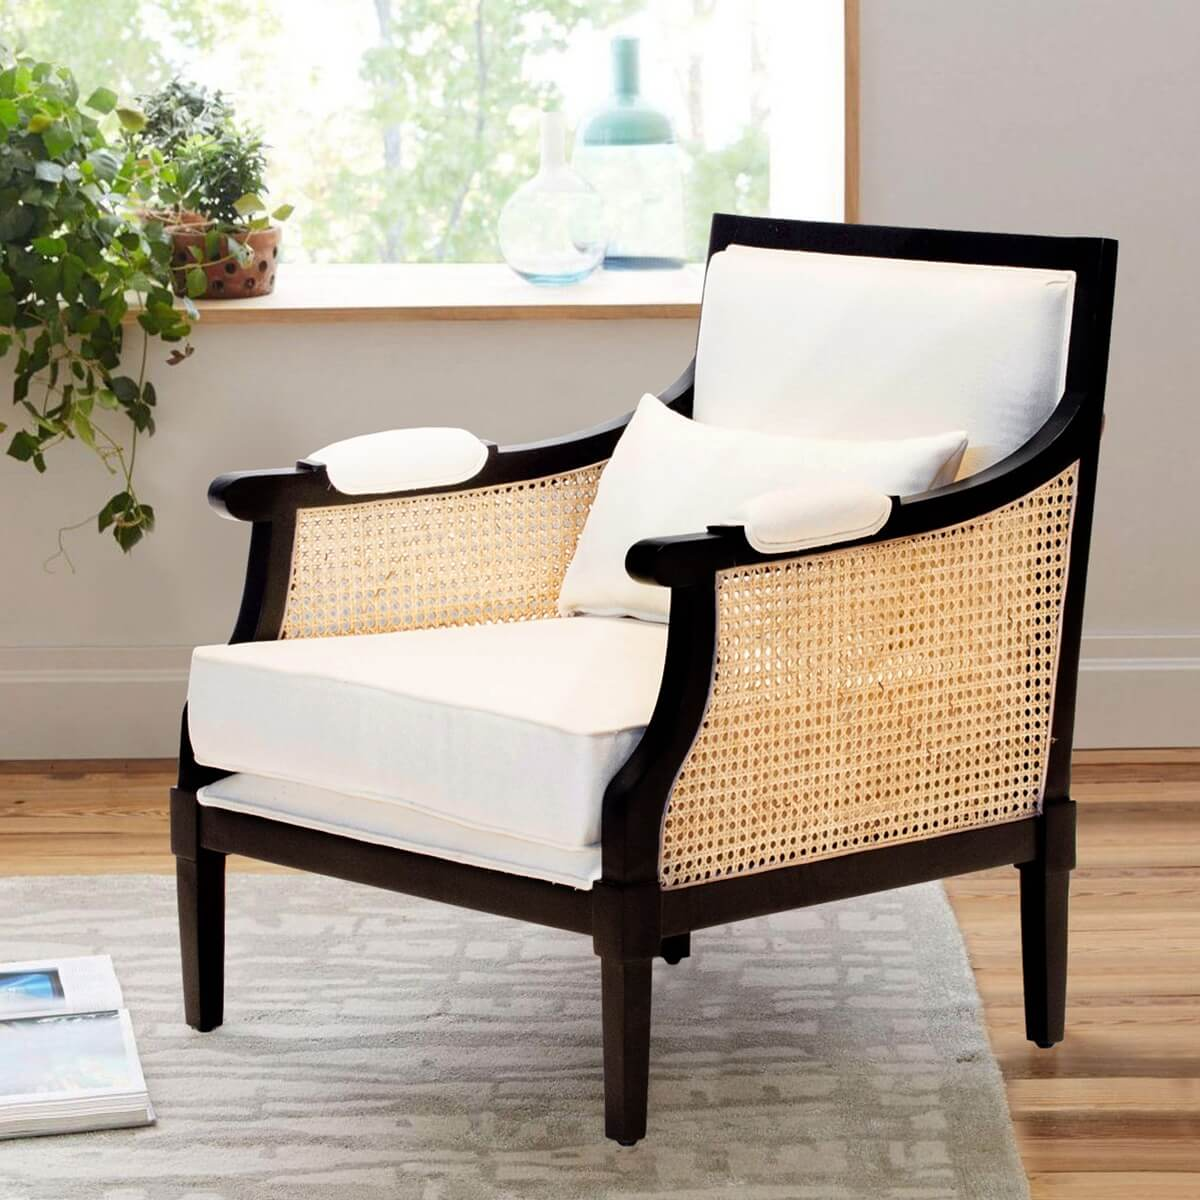 Nemaha Mahogany Wood Upholstered Caned Arm Sofa Chair